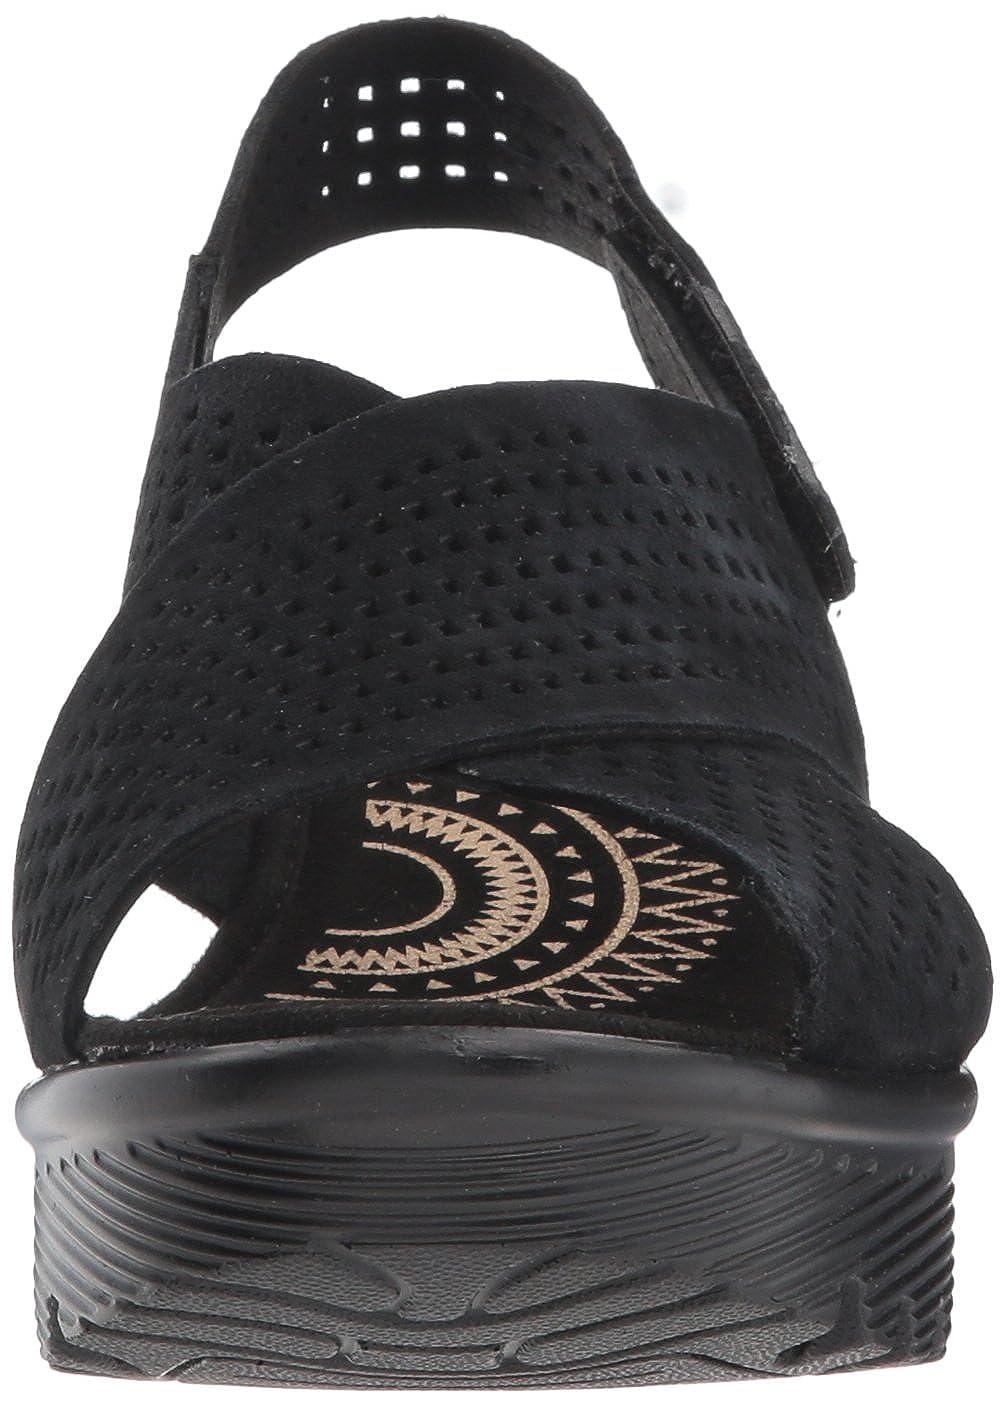 34b7ac54f791 Amazon.com  Skechers Women s Parallel Infrastructure Wedge Sandal  Shoes